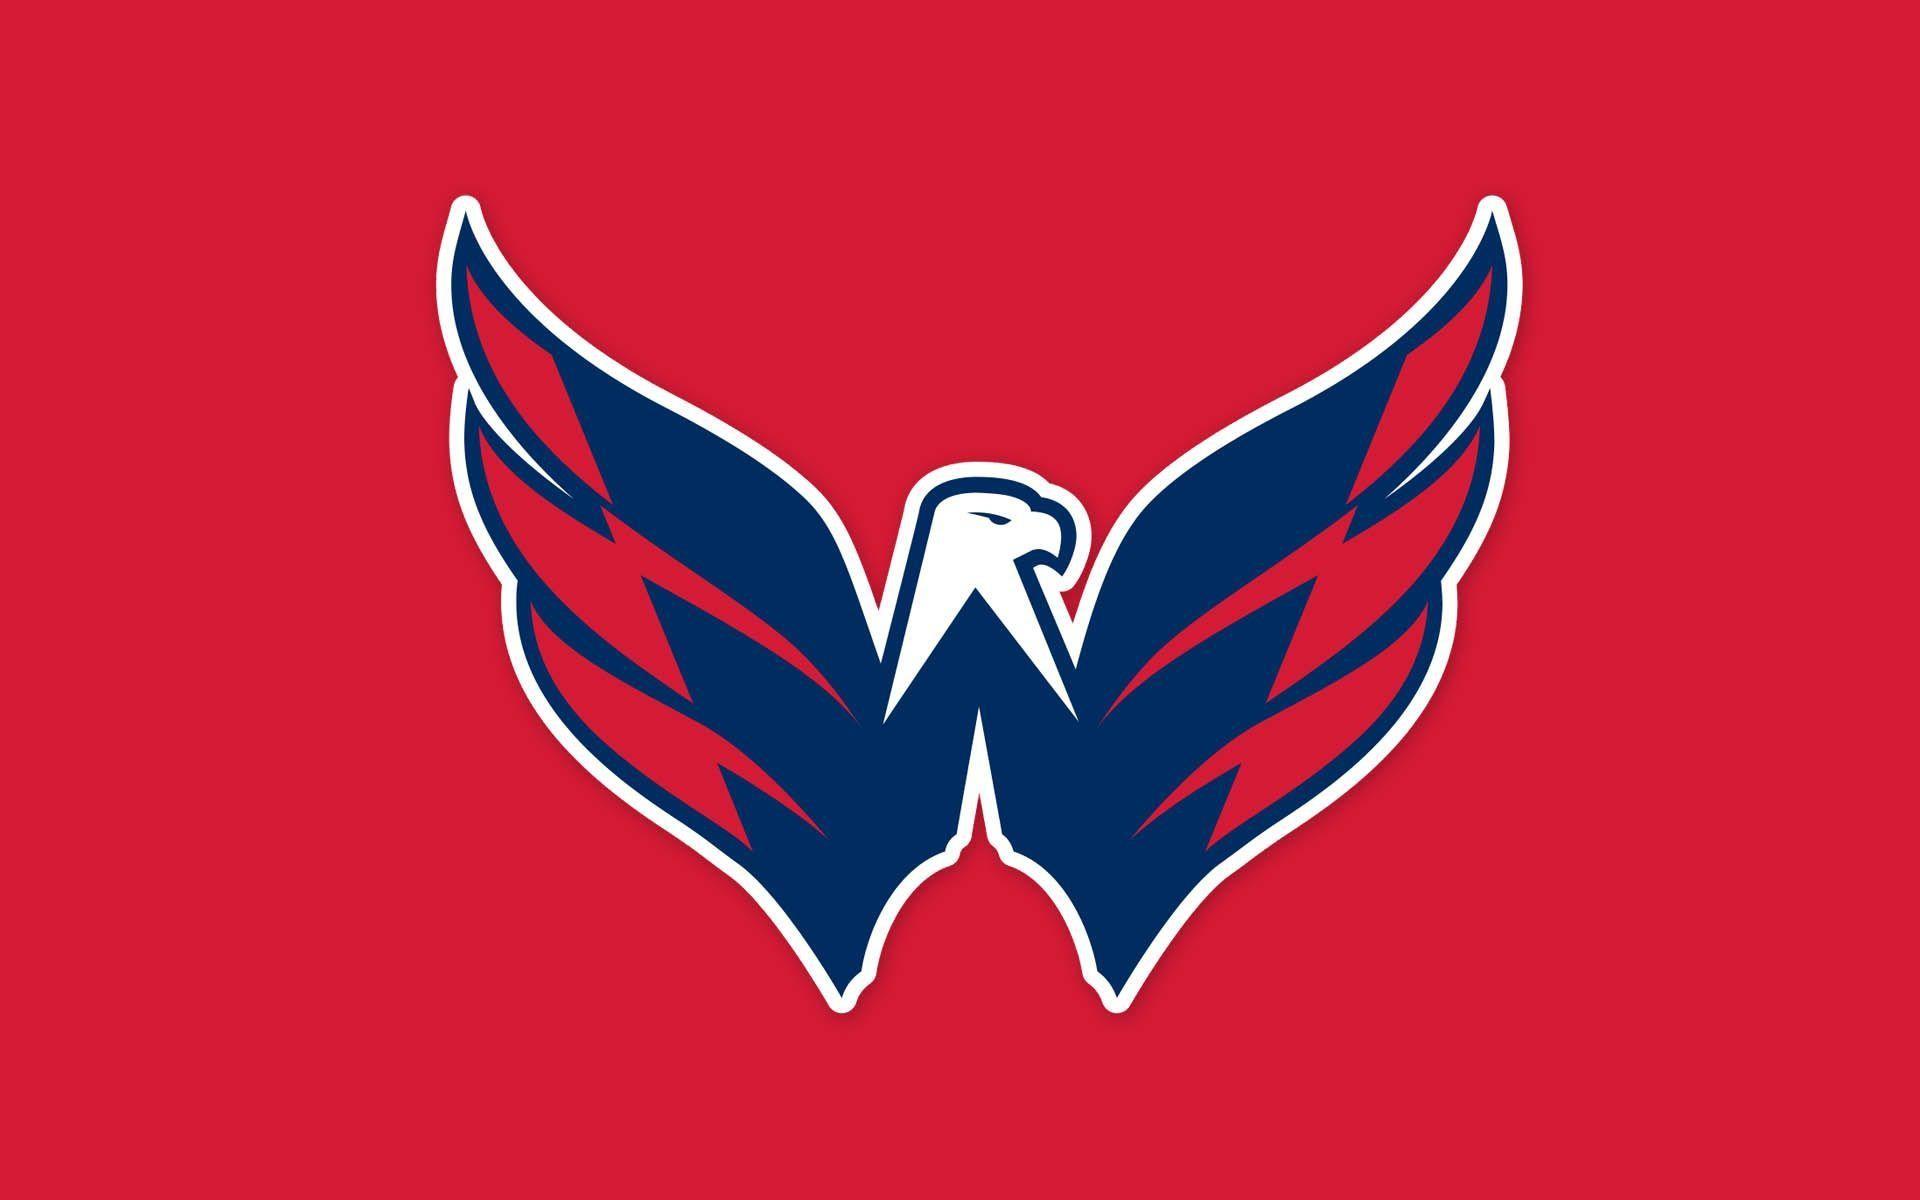 Washington Capitals Logo Wallpapers by James Sharp #9